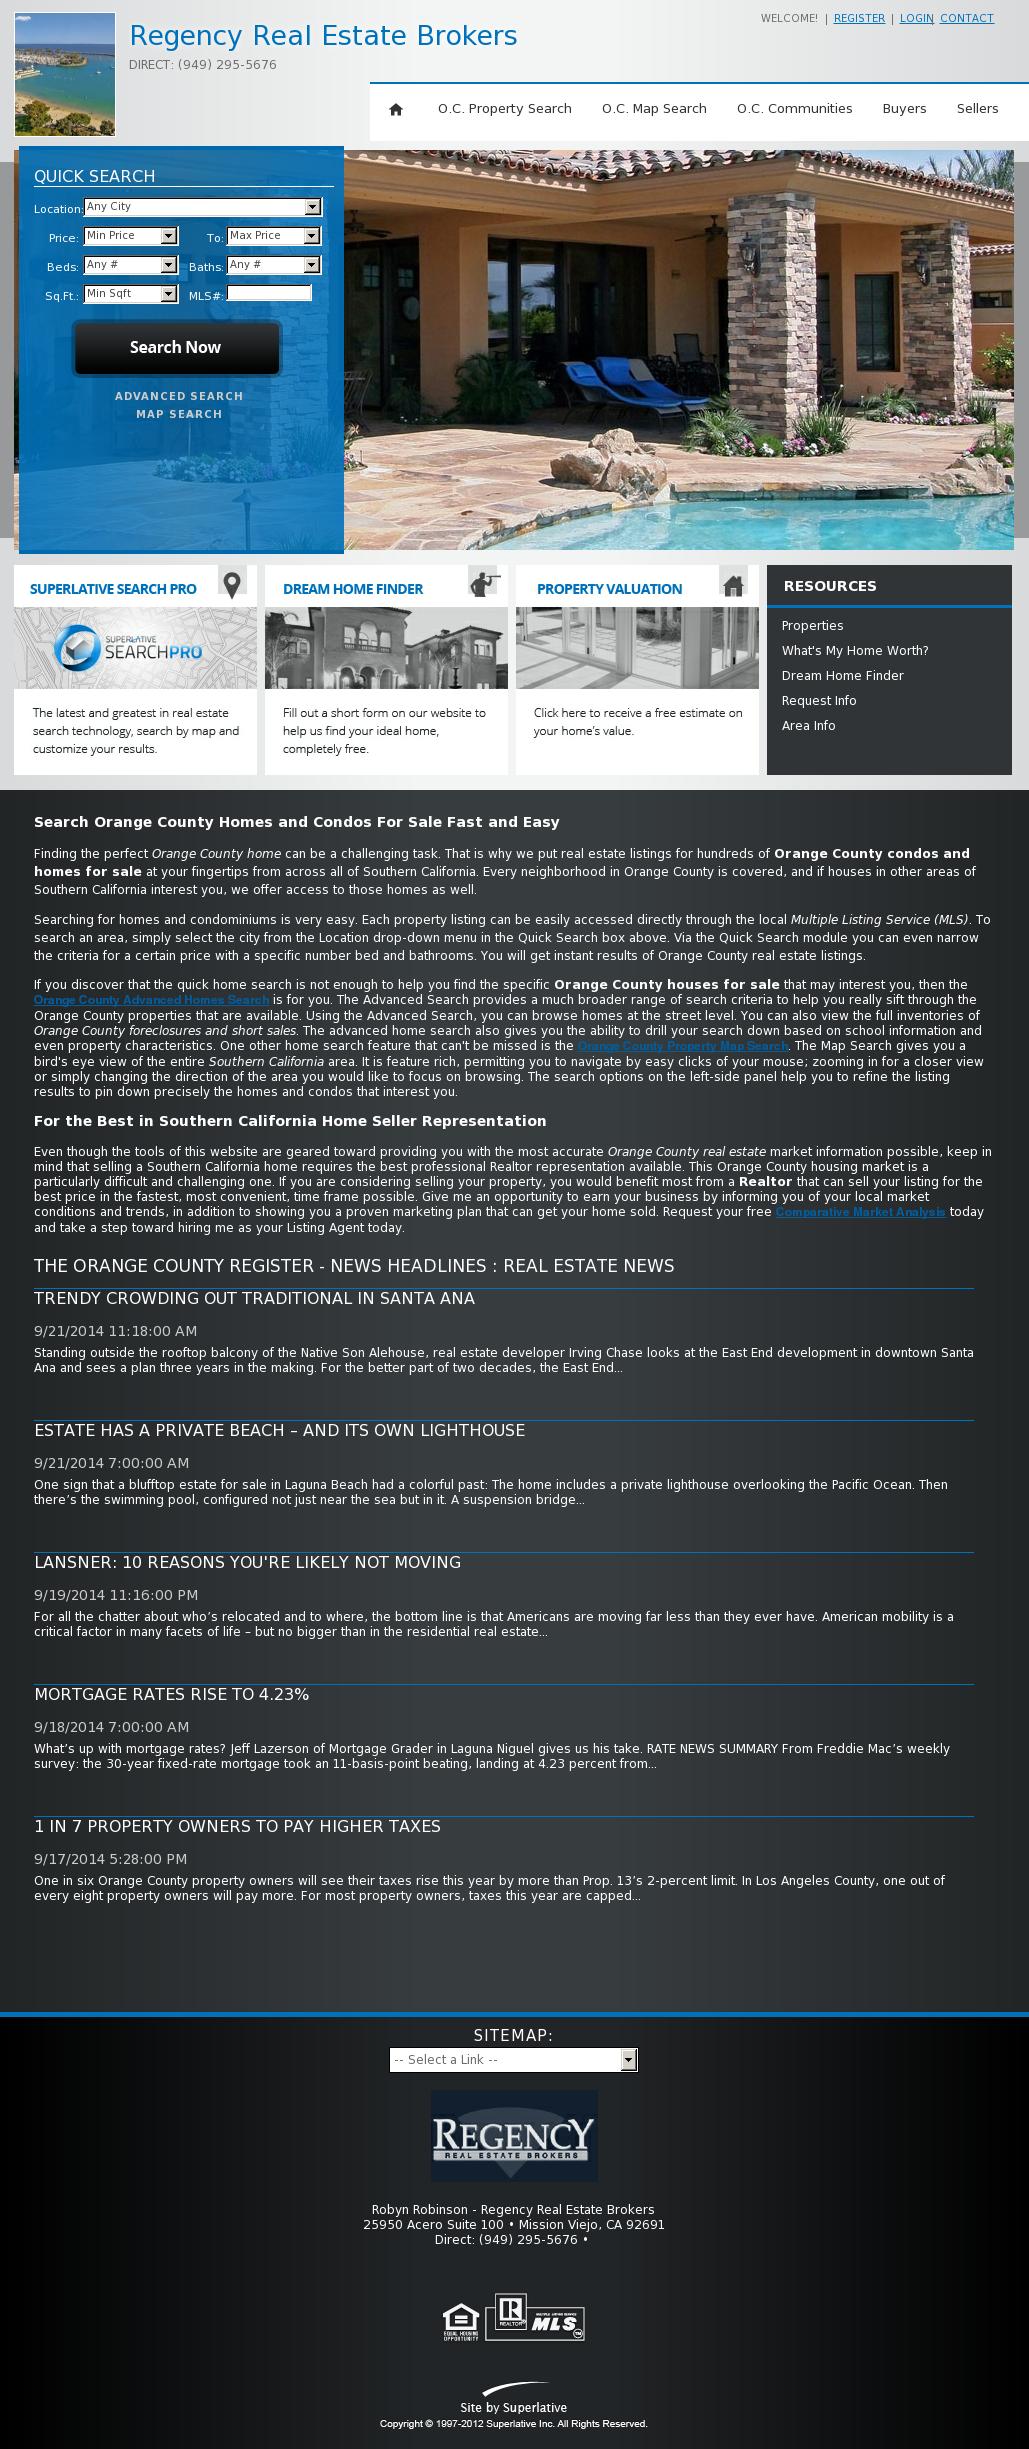 Ochomeandcondo Competitors, Revenue and Employees - Owler